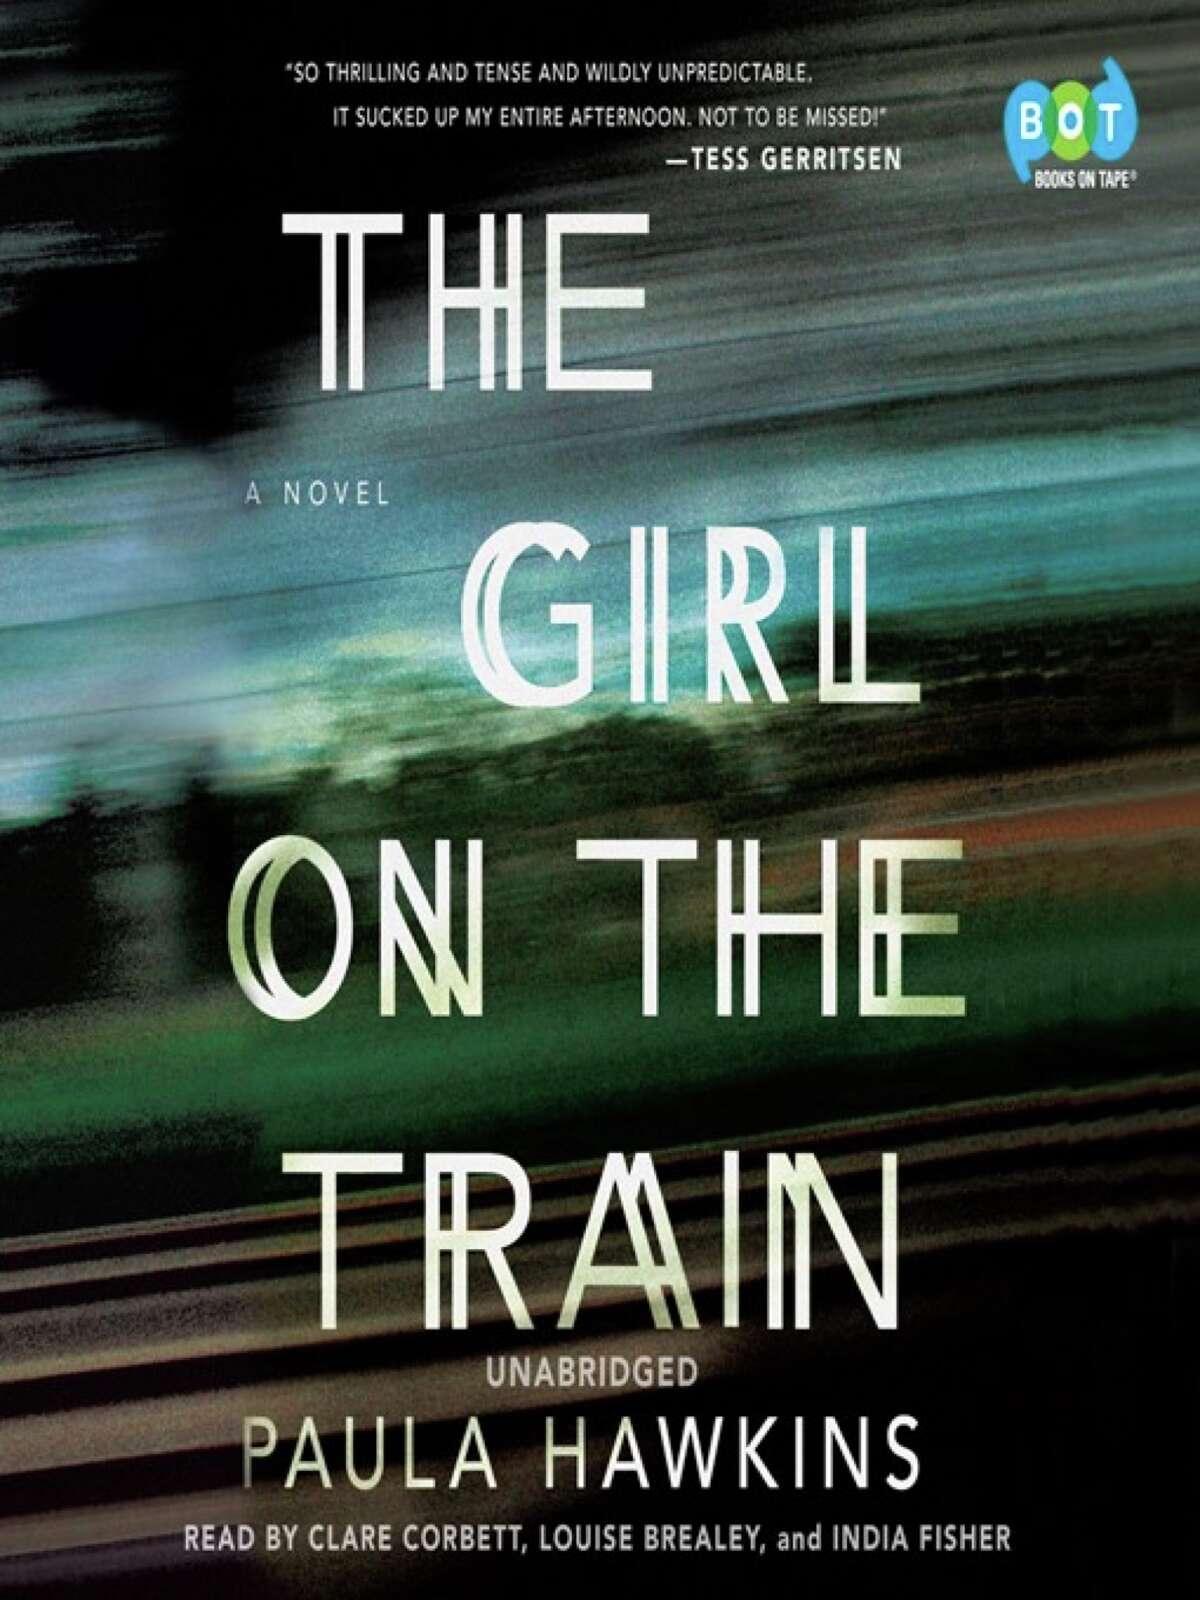 2) The Girl on the Train by Paula Hawkins